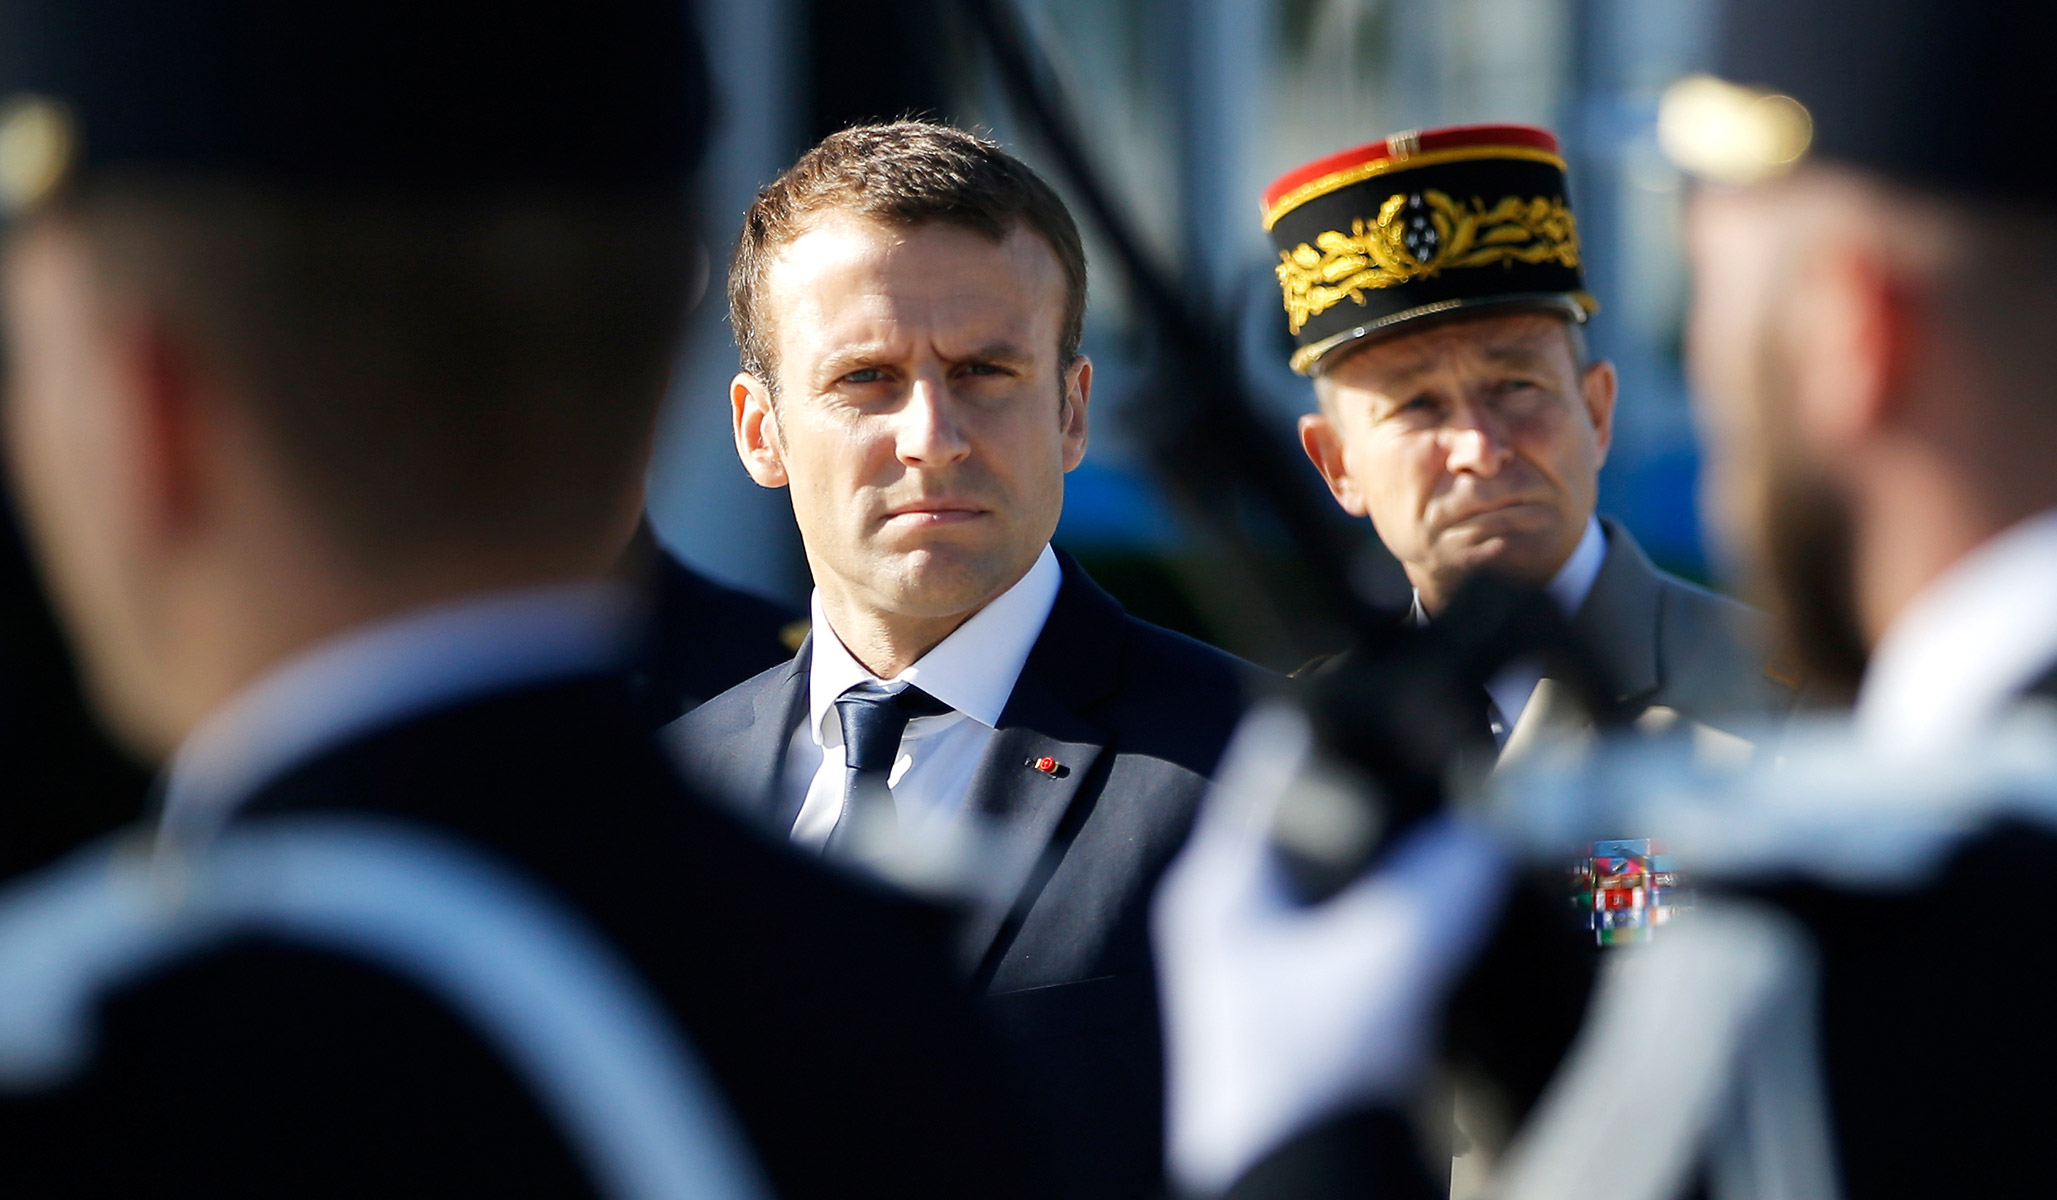 nationalreview.com - Victor Davis Hanson - Mad Meditations of Monsieur Macron